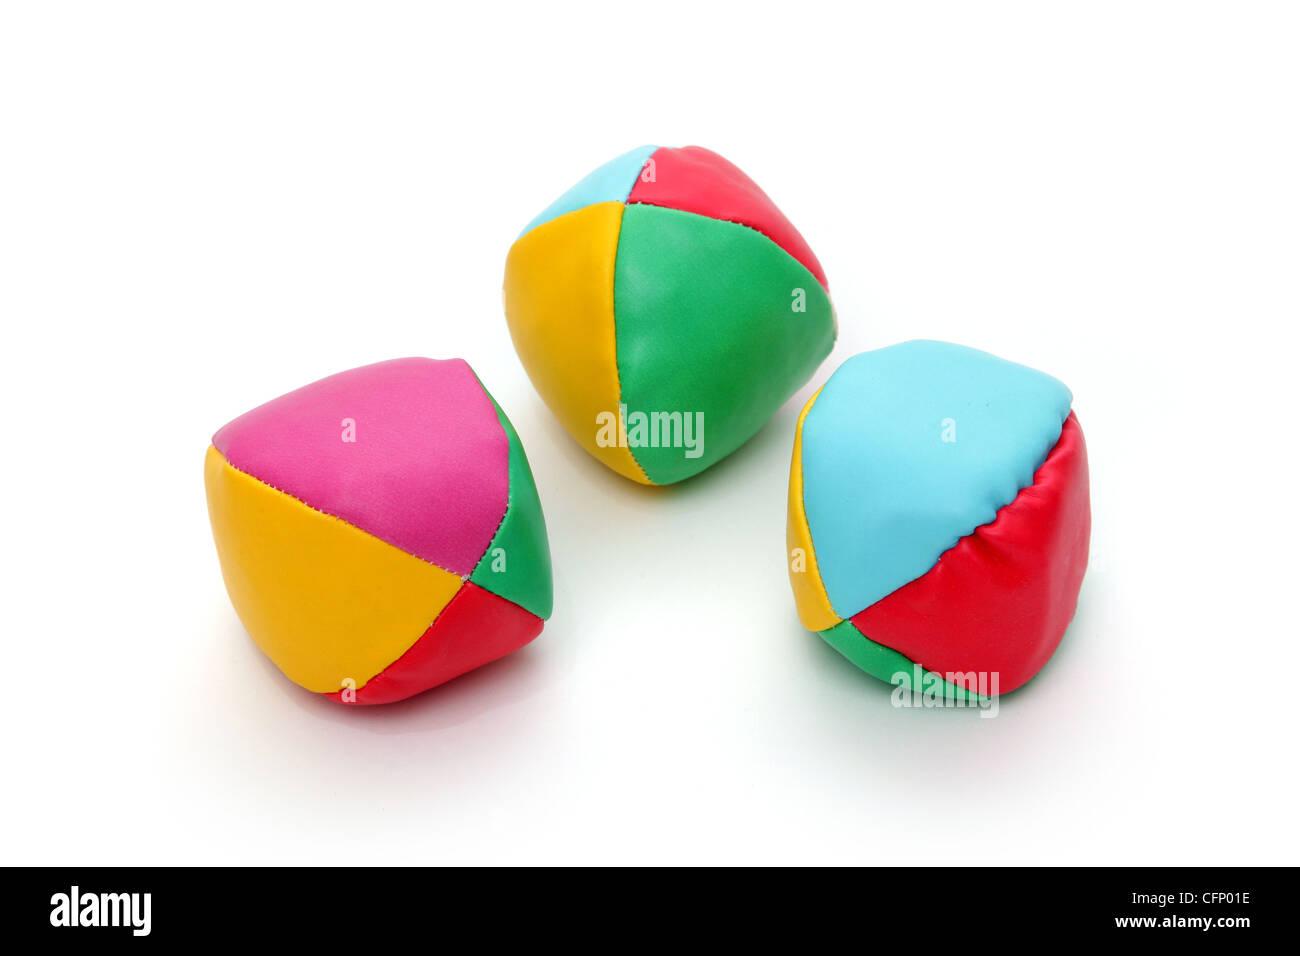 Juggling Balls, Tony Rusecki - Stock Image